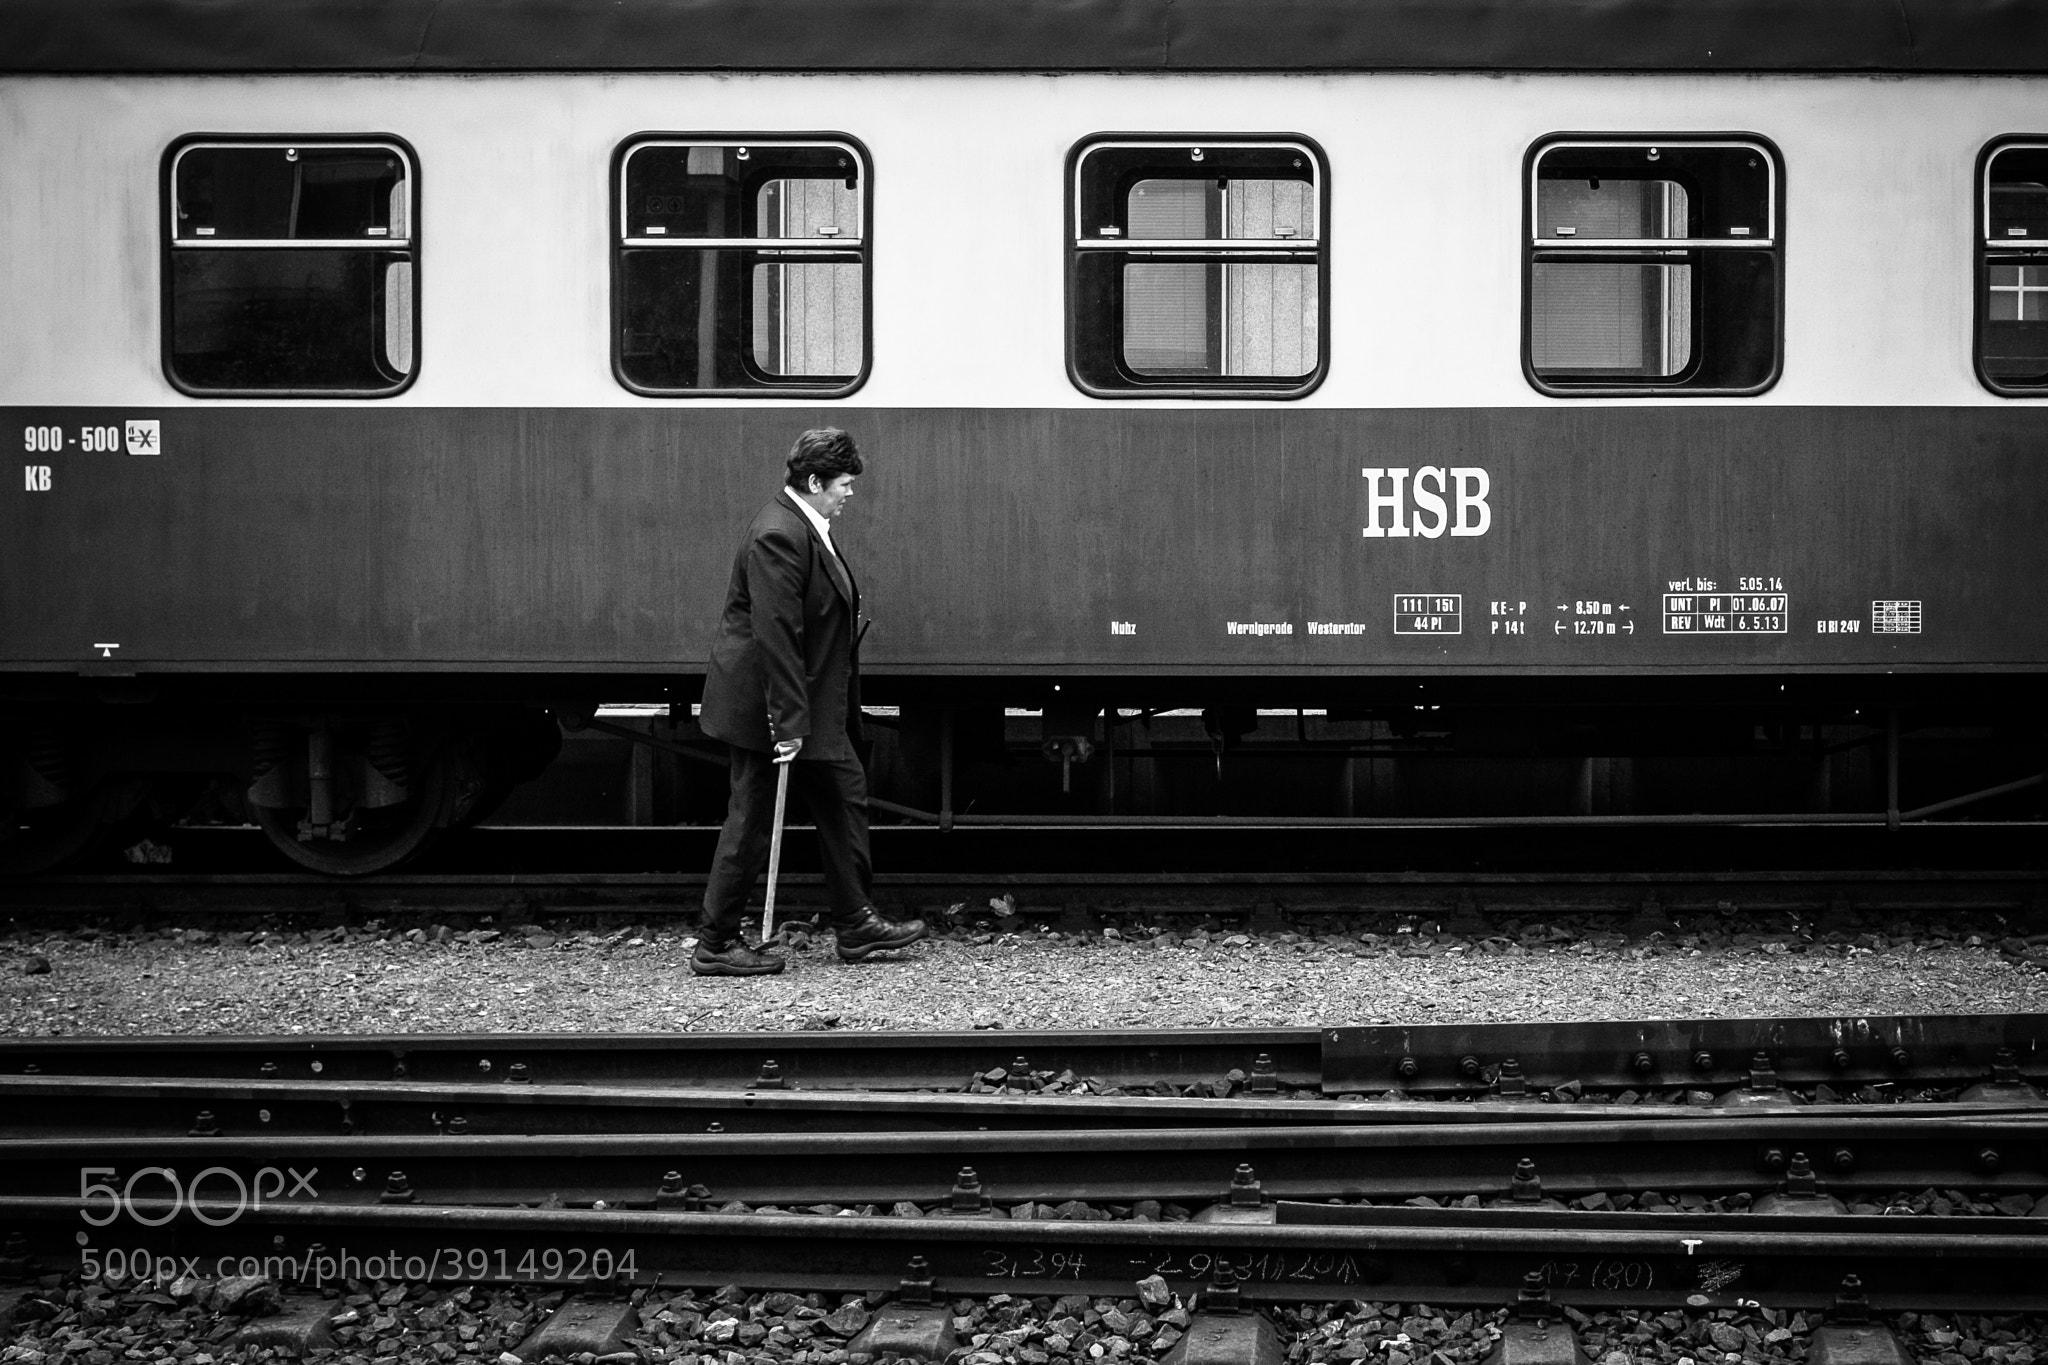 Photograph HSB by Stefan Schulze on 500px